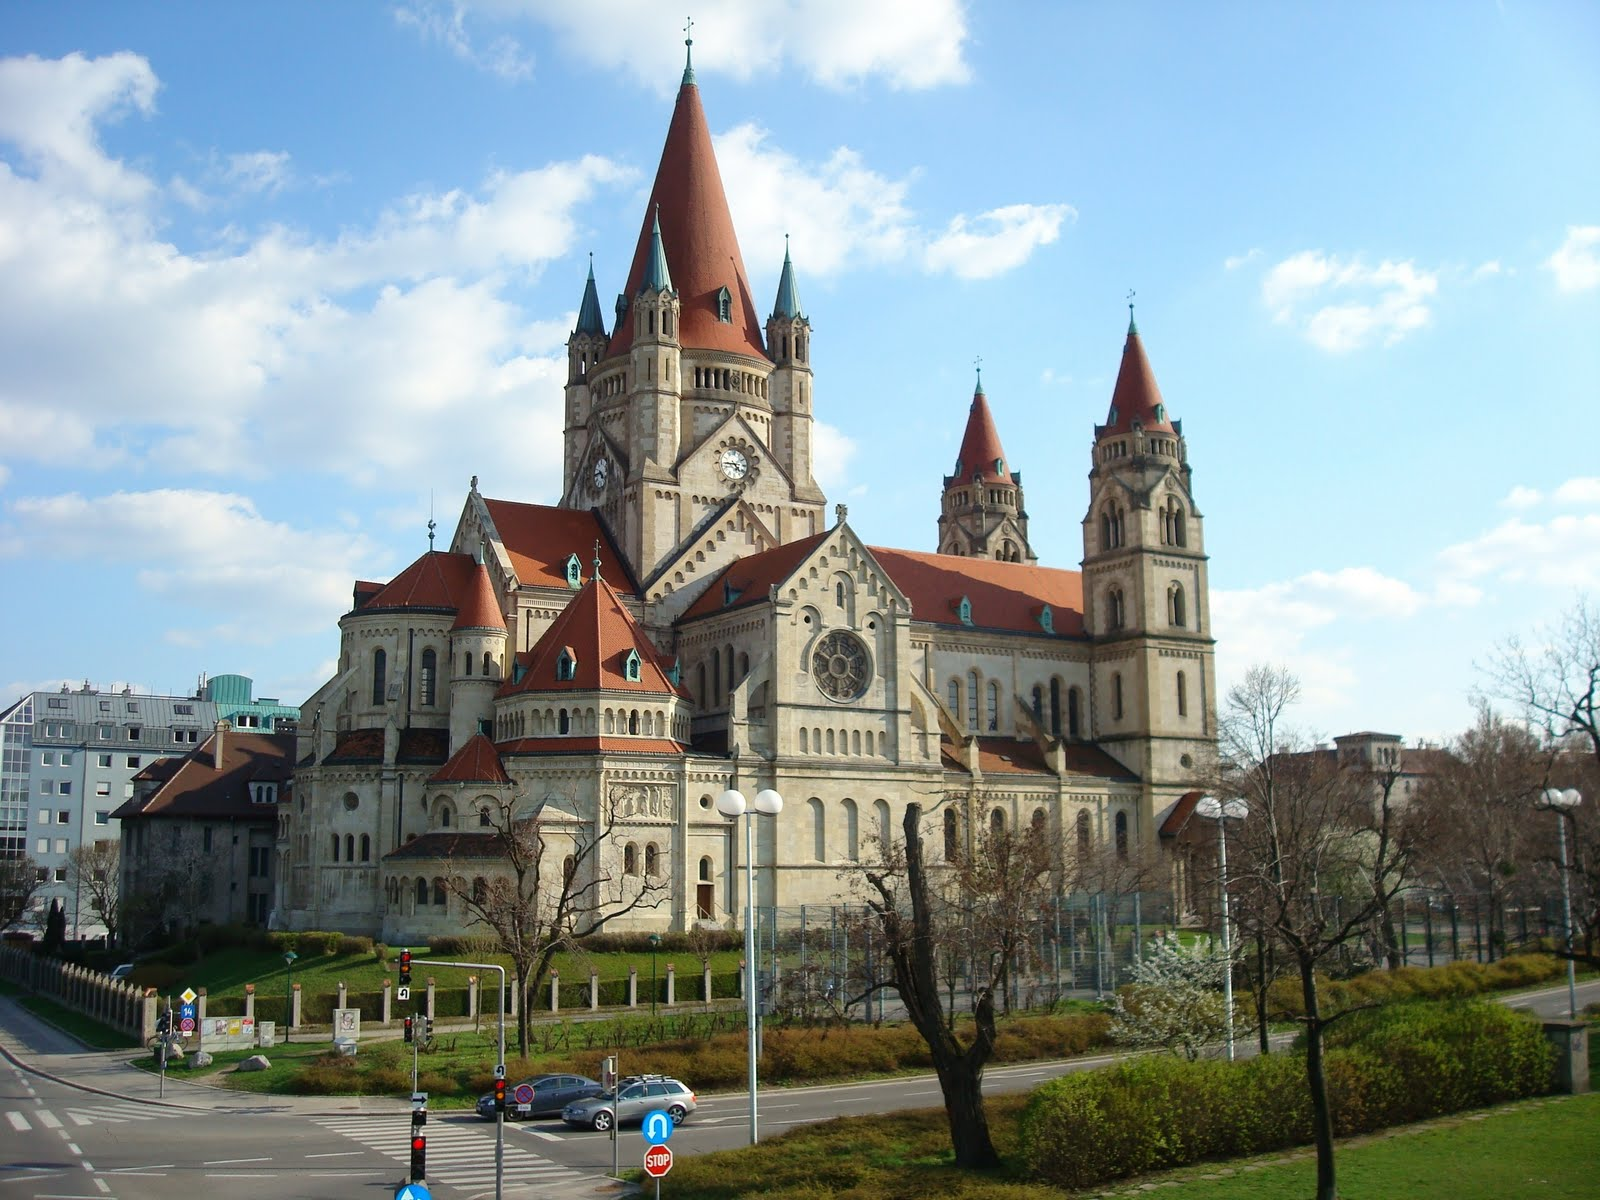 Alasan kuliah di Austria - arsitektur yang unik